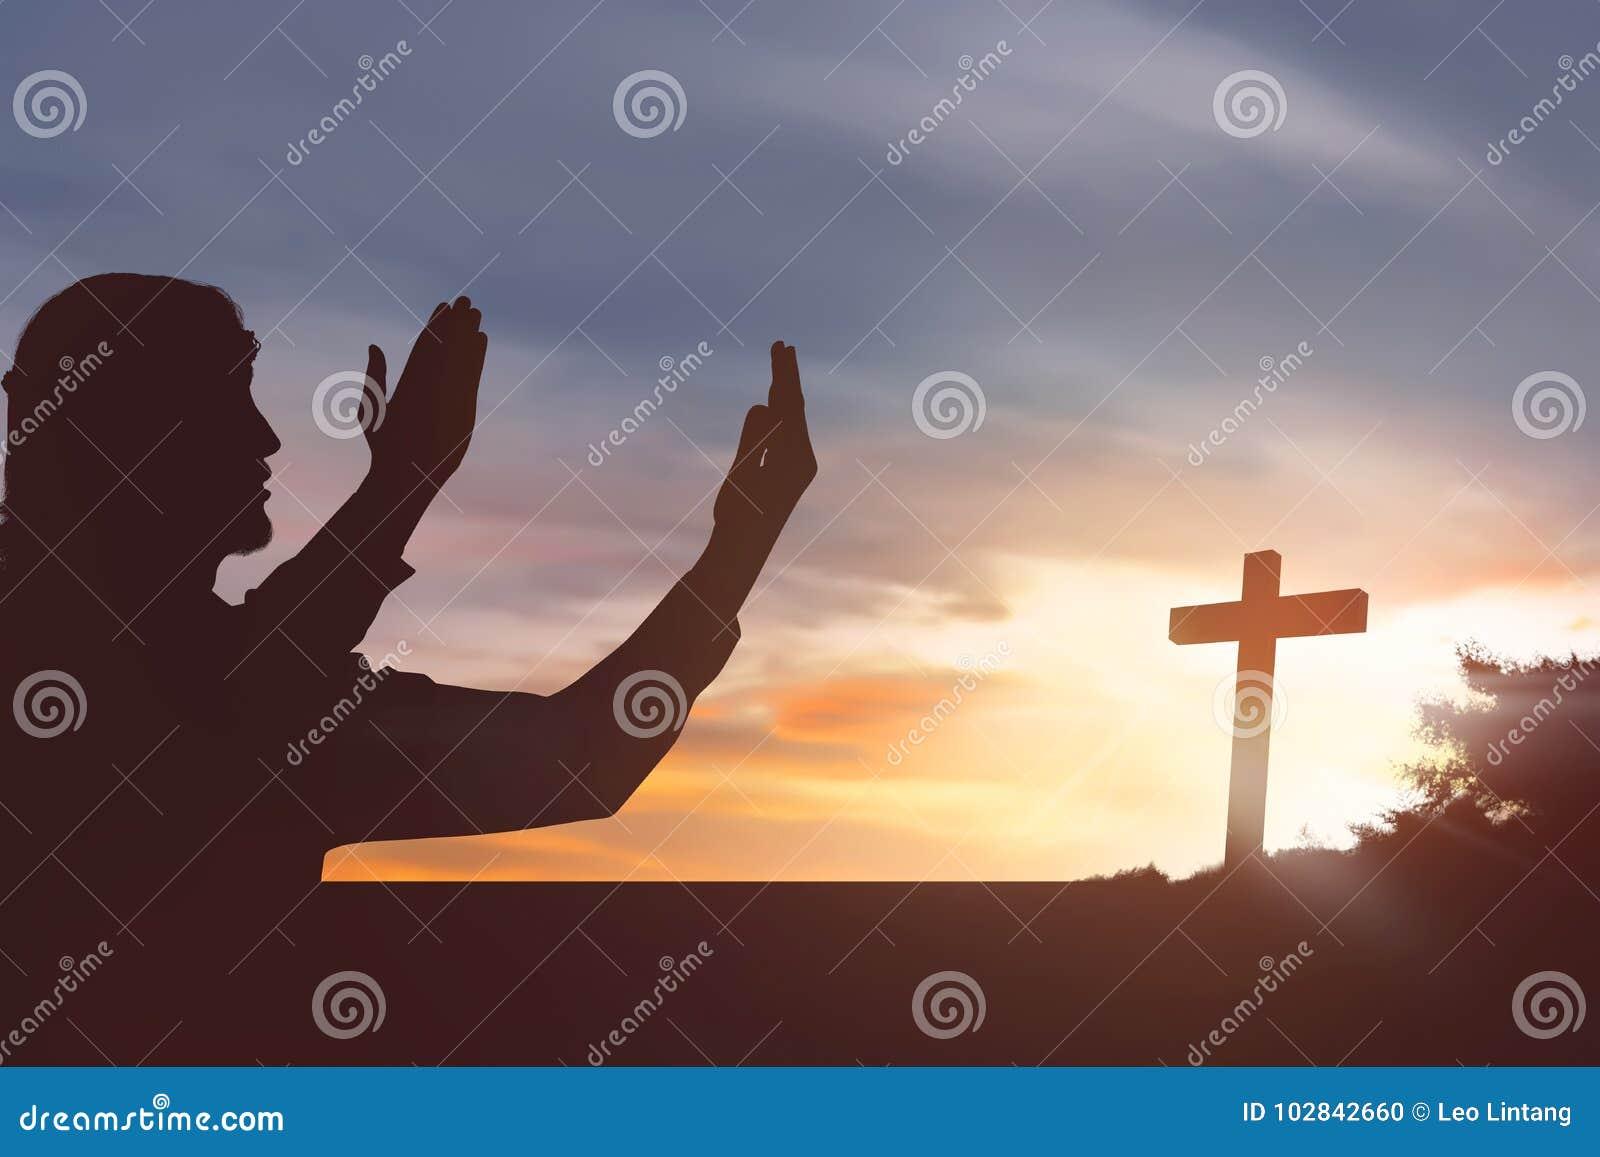 Silhouette man raising hand while praying to jesus